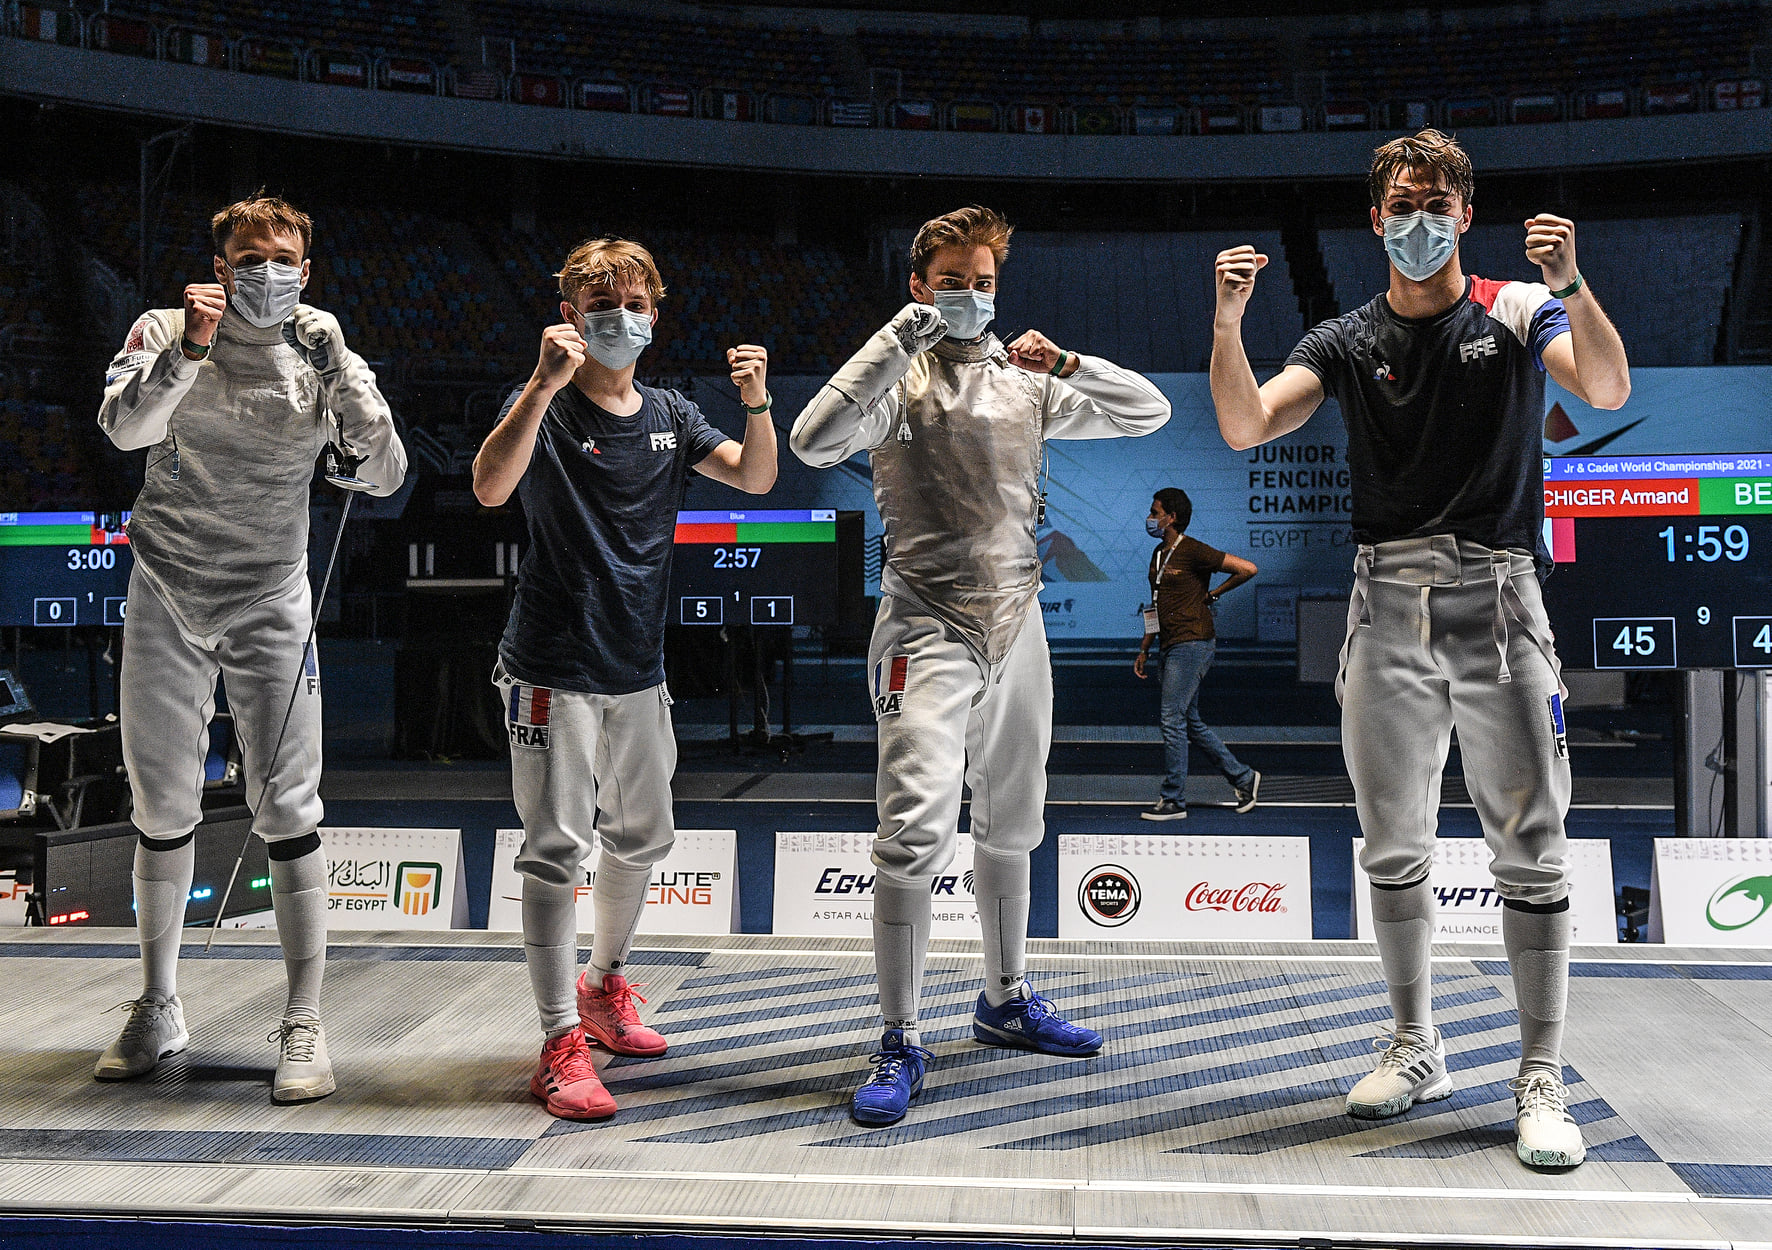 Constant Roger, Paul Antoine De Belval, Valerian Castanie, Armand Spichiger, França esgrima florete foil france fencing